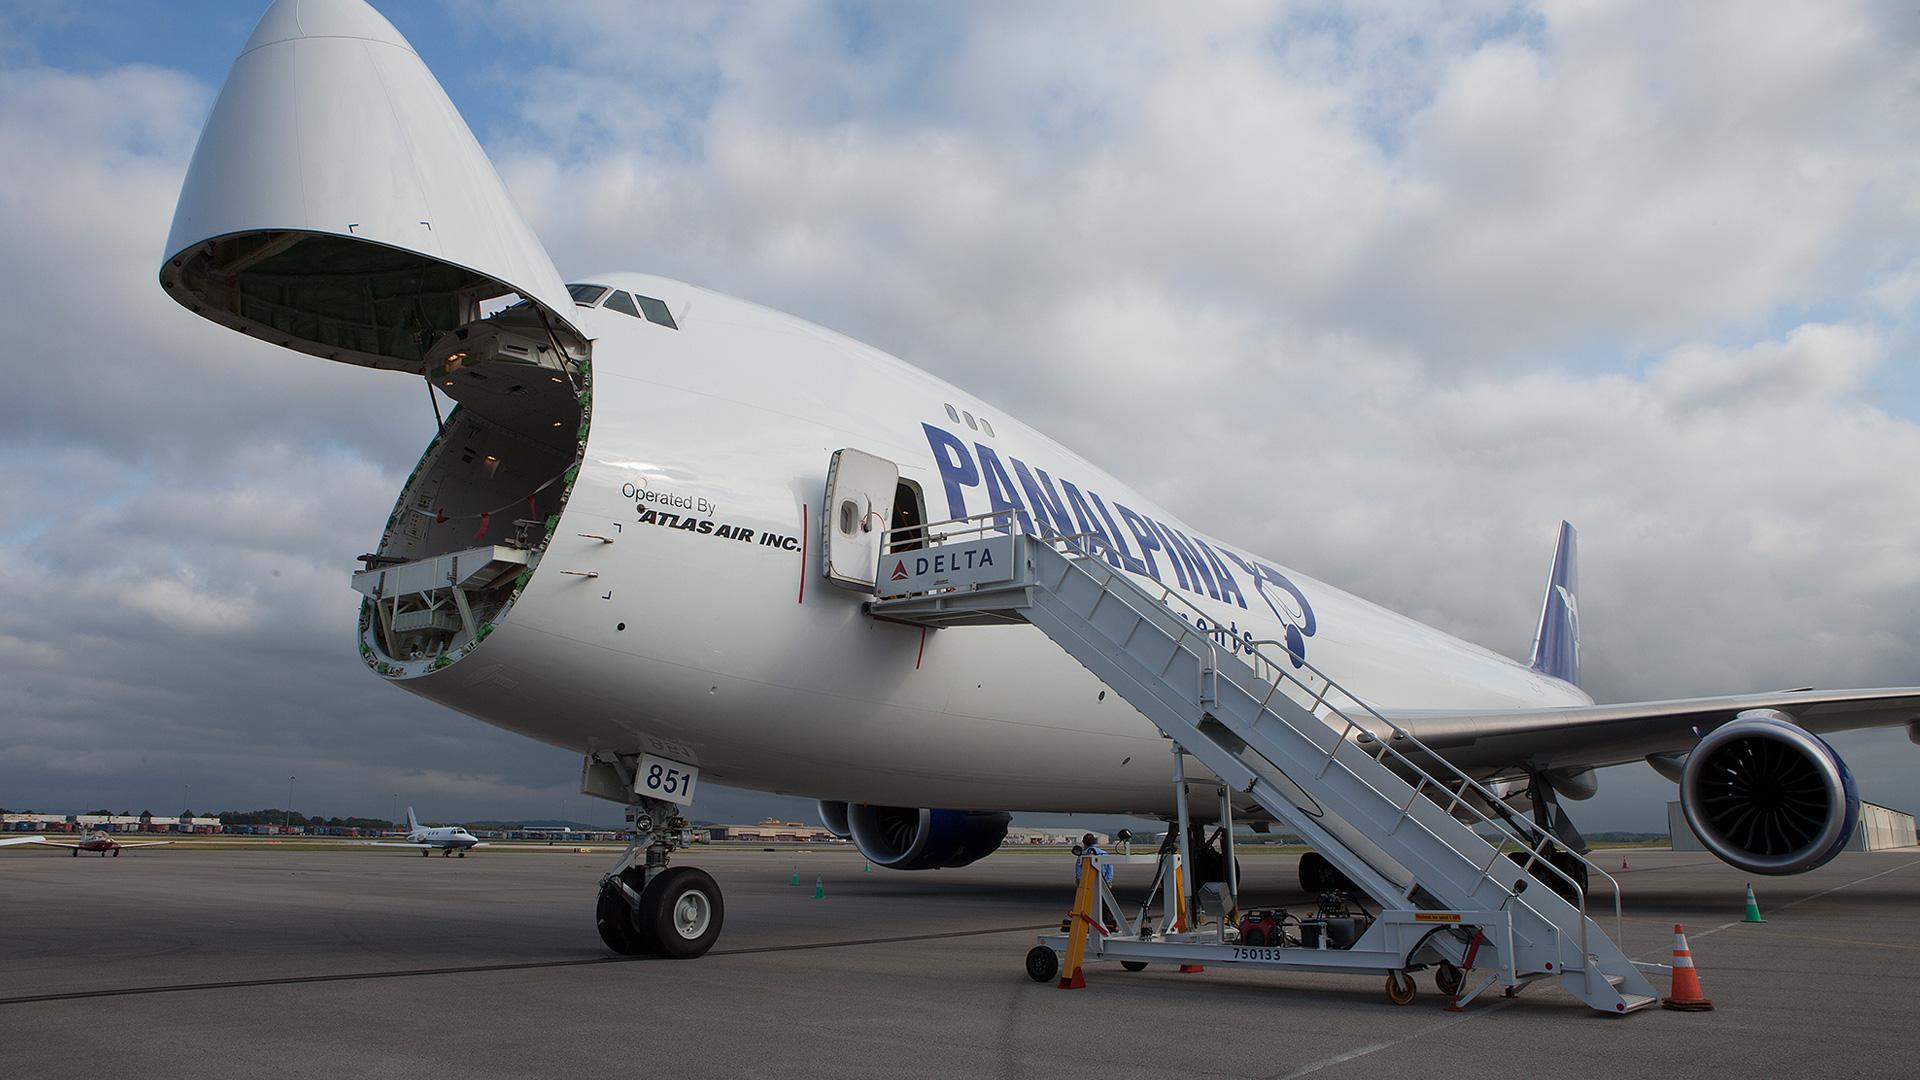 Panalpina Cargo Plane